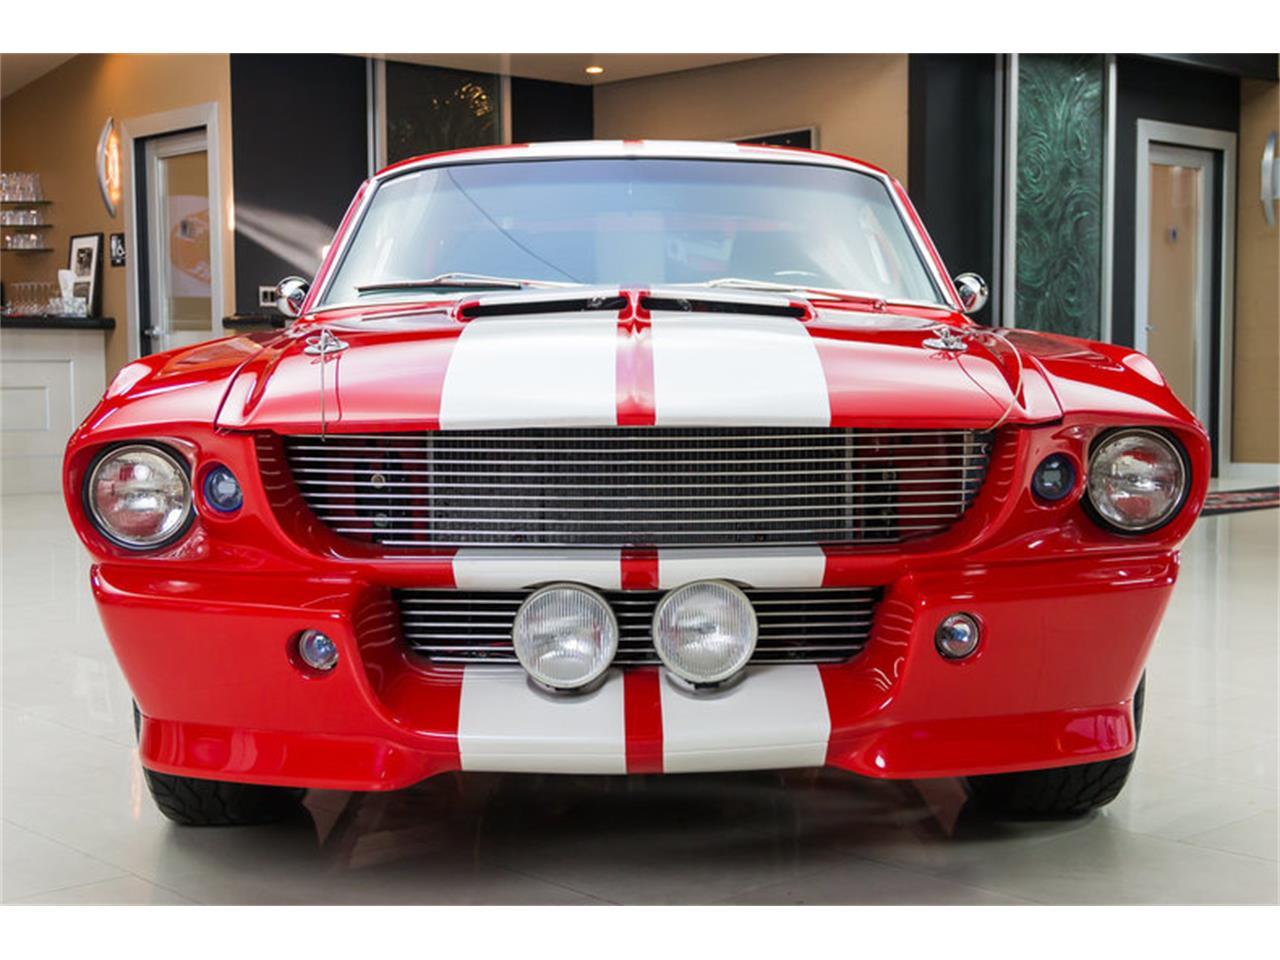 1967 Eleanor Mustang Restomod For Sale